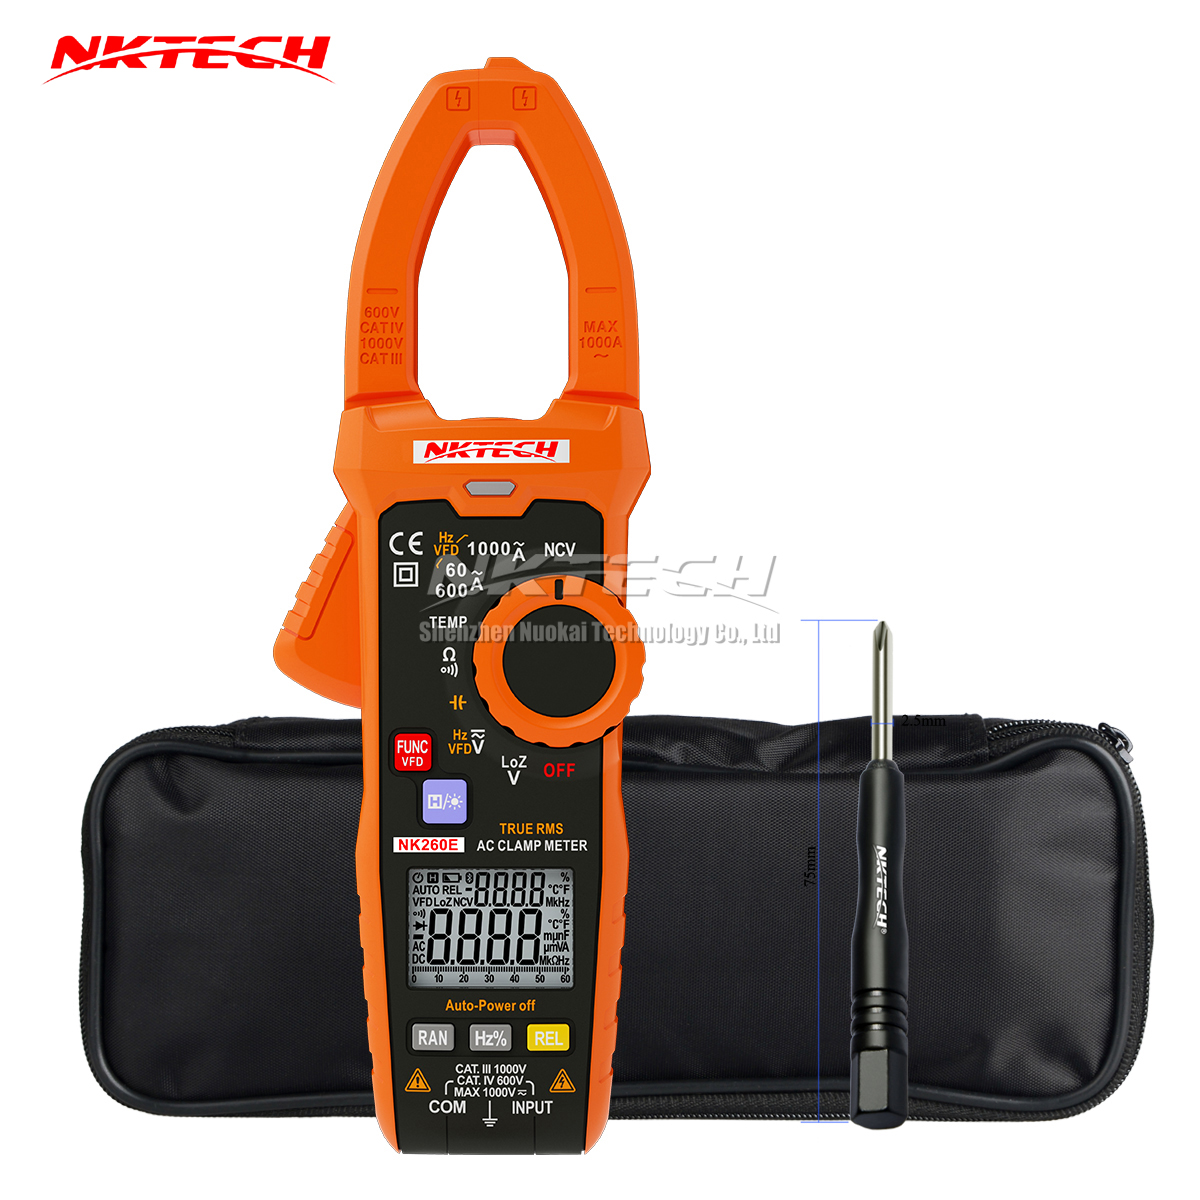 NKTECH NK260E Digital Clamp Meter 1000V VFD Analogue Bar Graph Ture RMS Temperature AC DC V